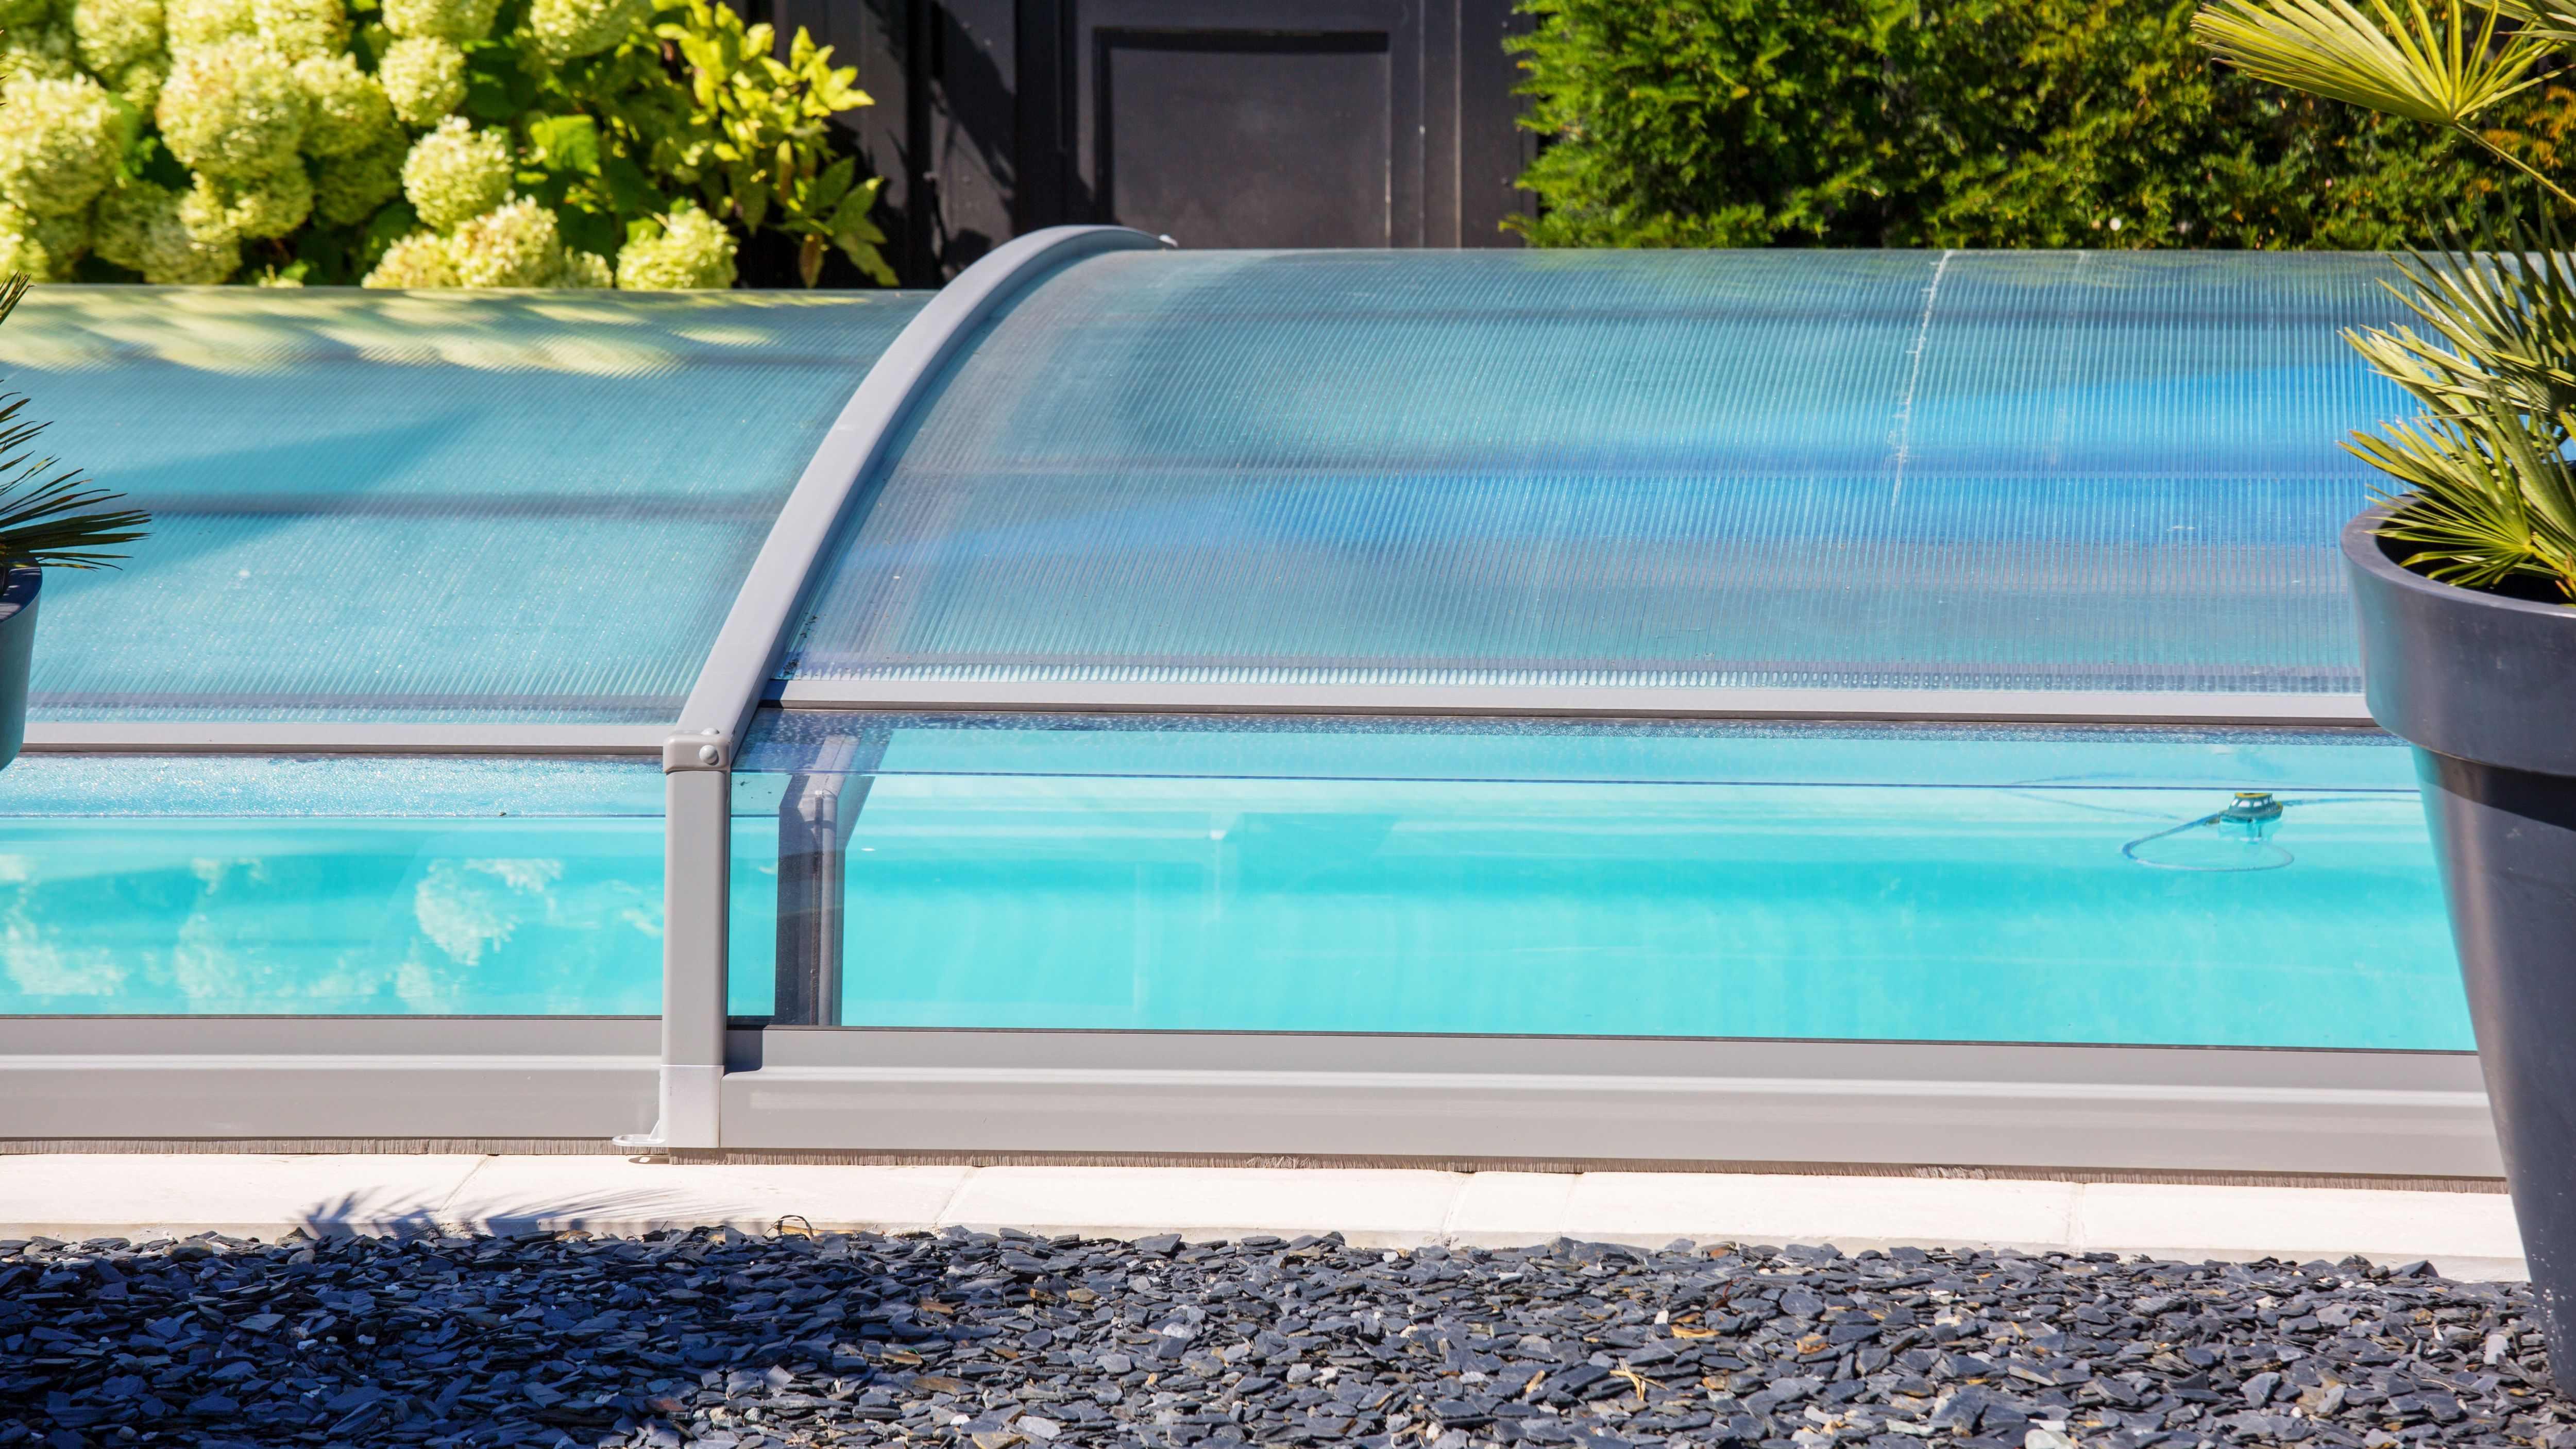 Comment choisir son abri piscine